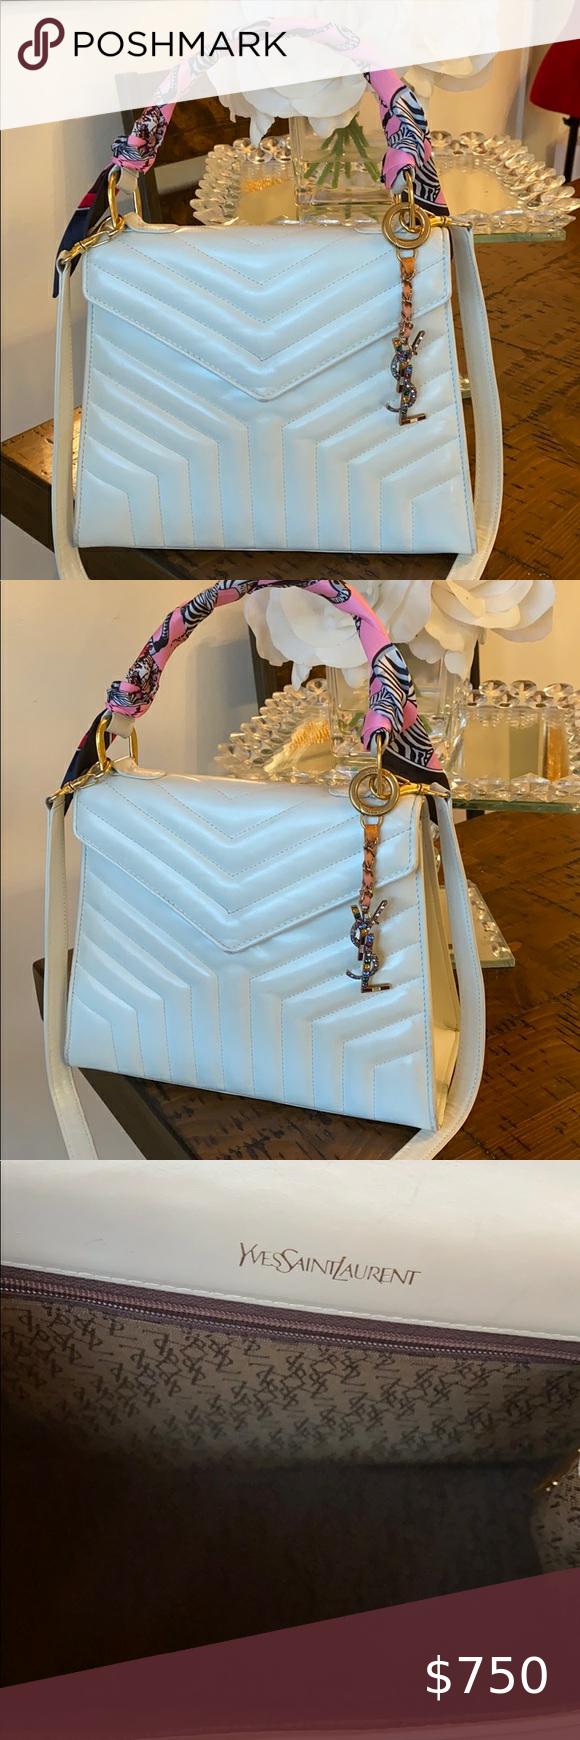 saint laurent bags on sale, ysl roady handbag